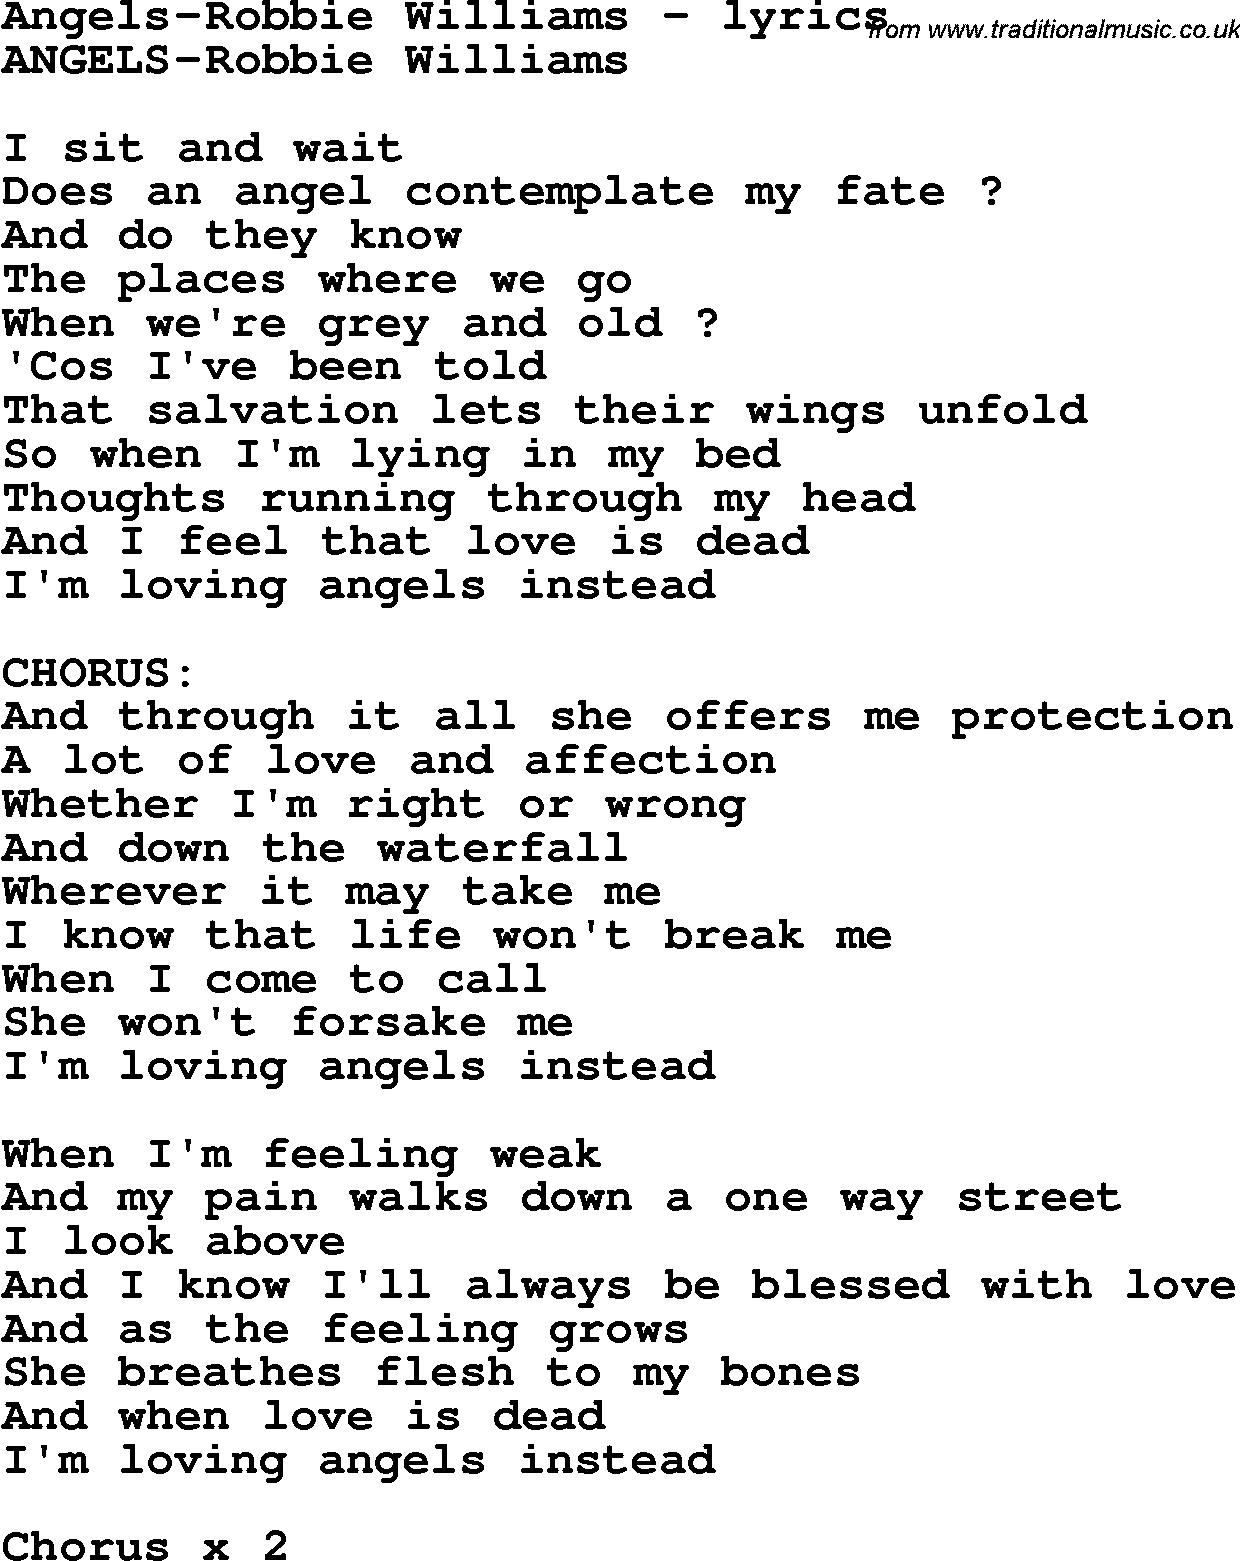 Angel Robbie Williams Lyrics Cerca Con Google Angels All Around